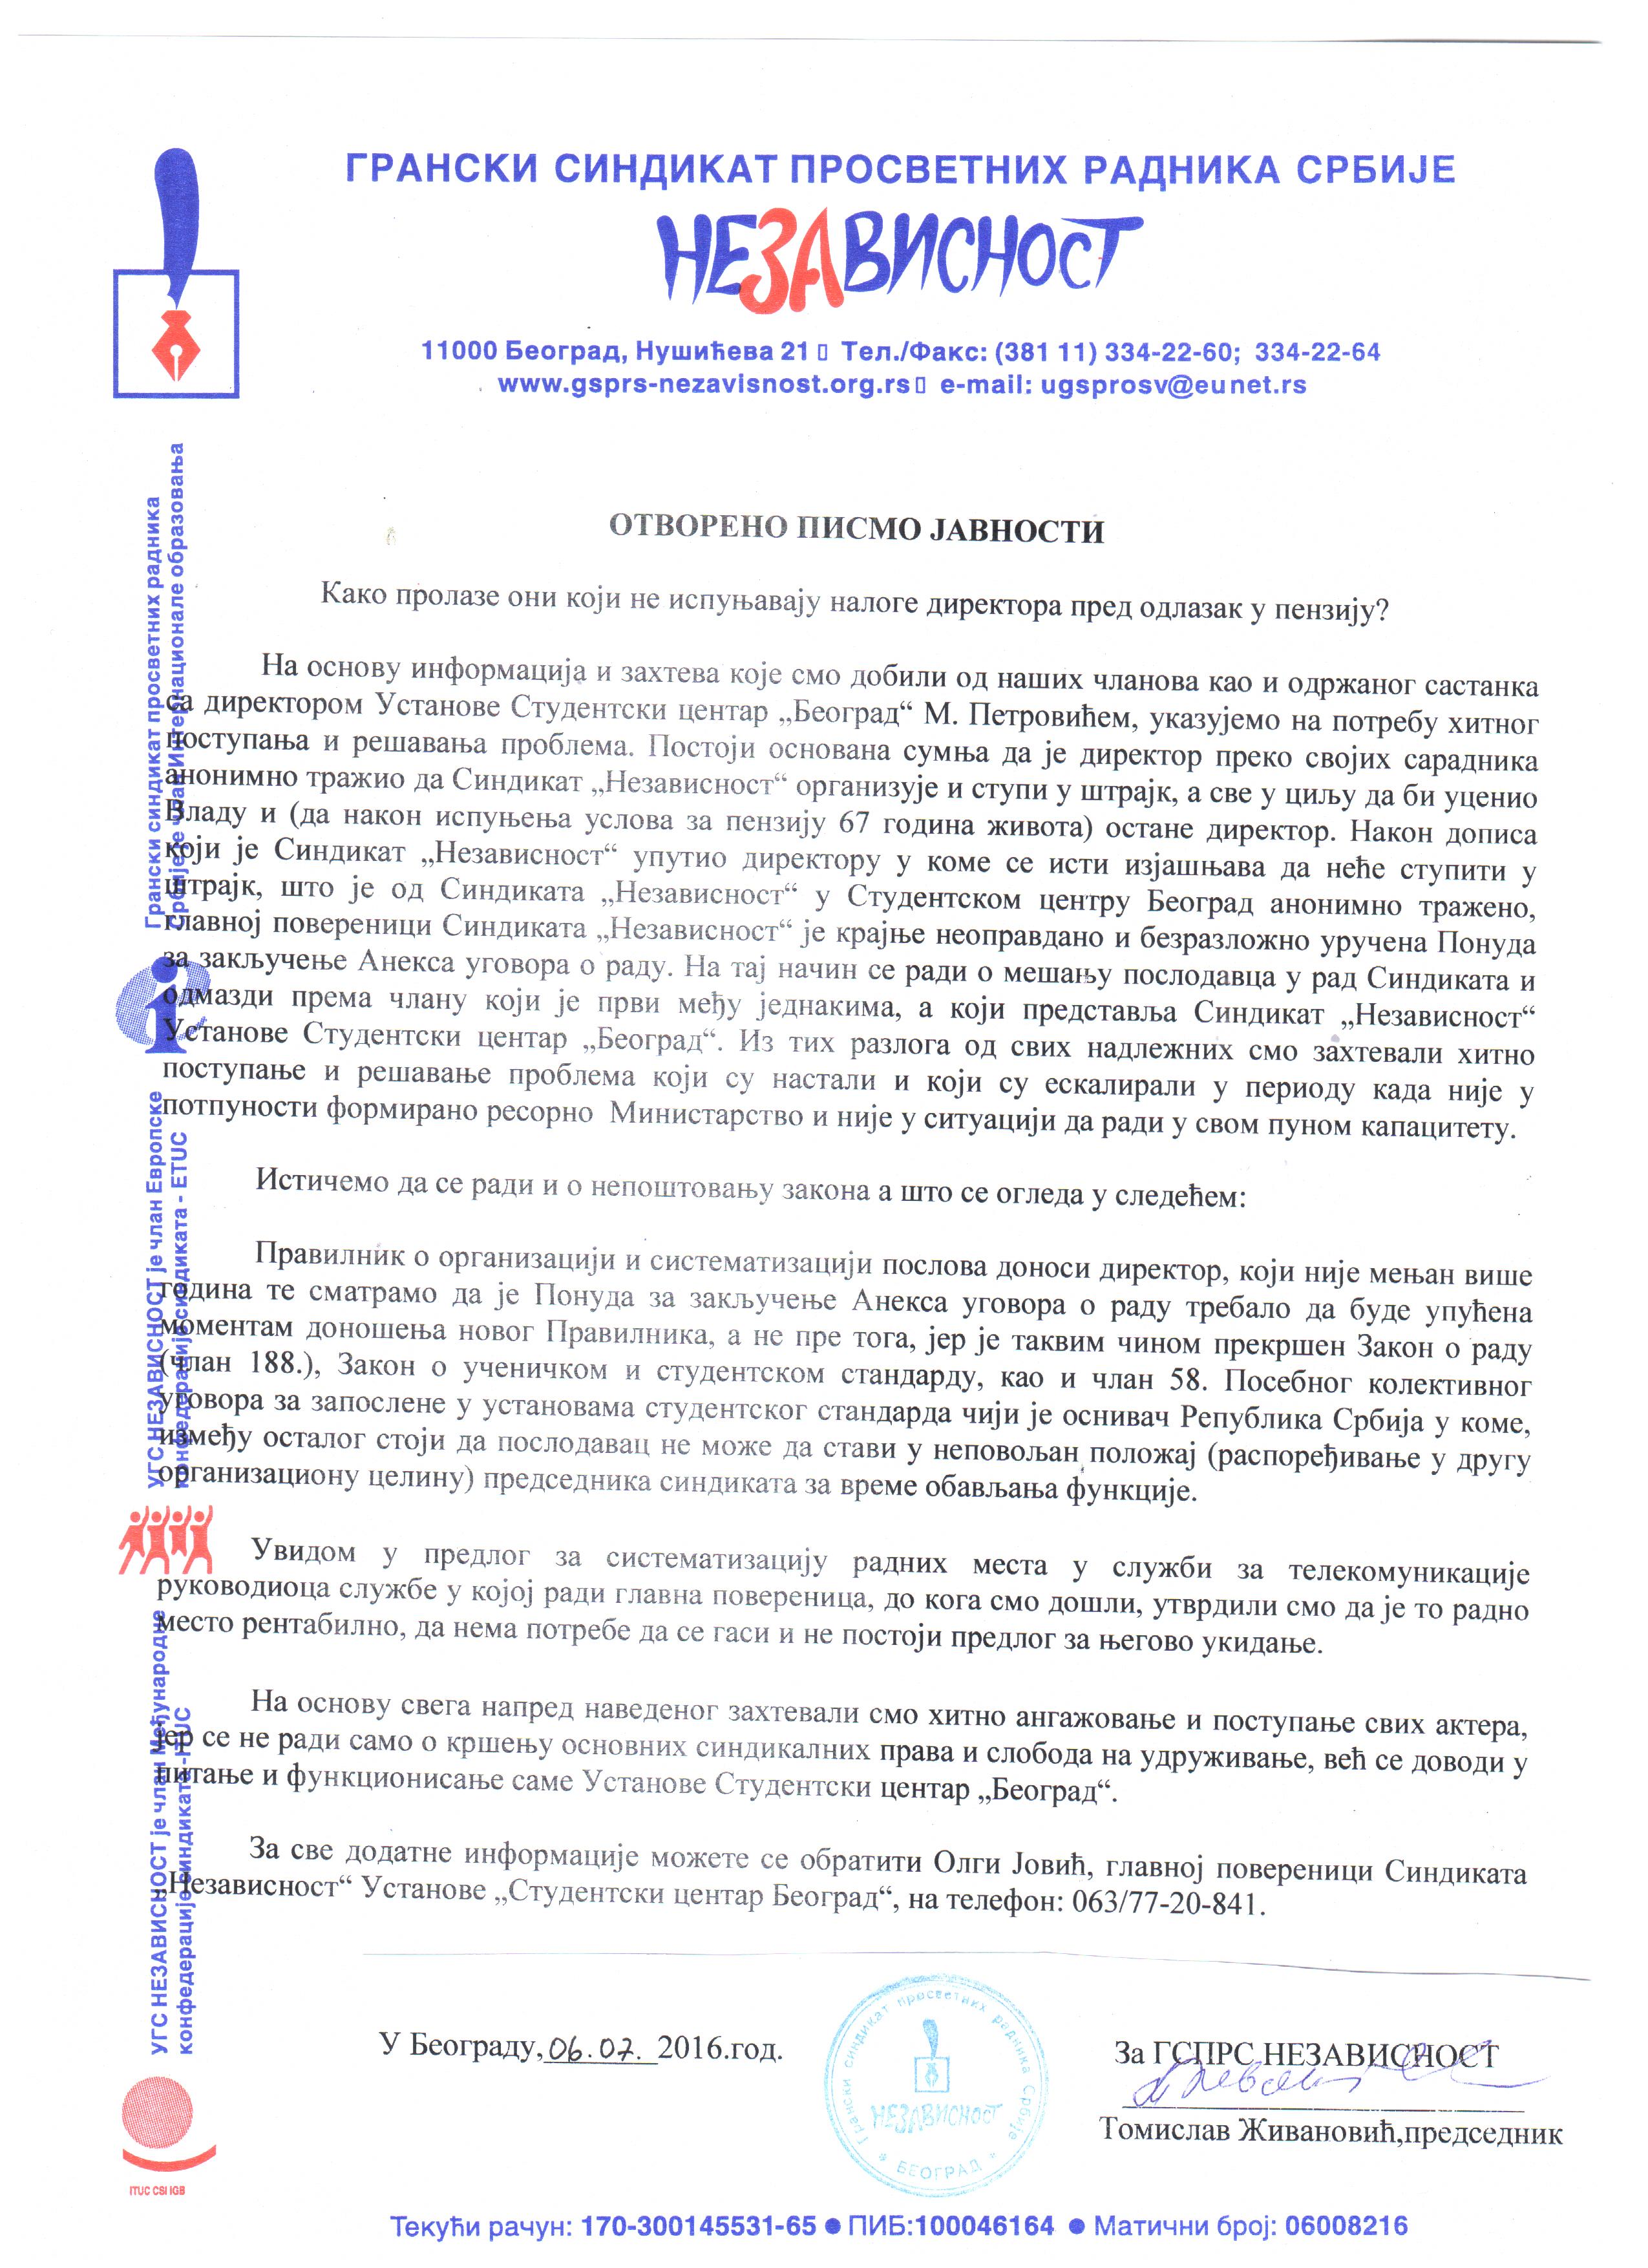 Otvoreno pismo javnosti